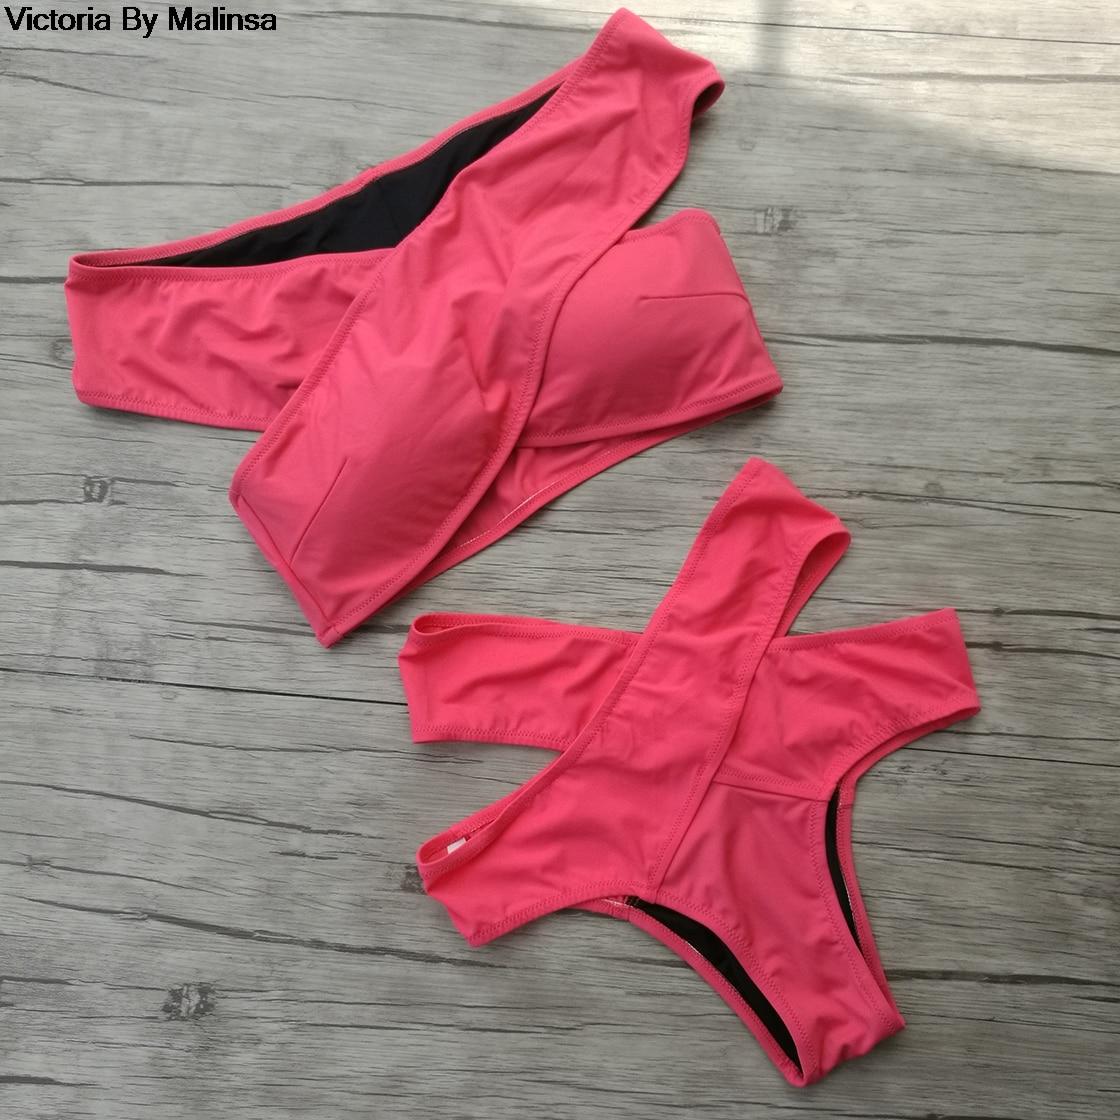 Women's Sexy Bikini sets Black Red Bikinis Top Women Bikini Bottoms Swimwear Green Secret Brazilian High Waist Bottom 2